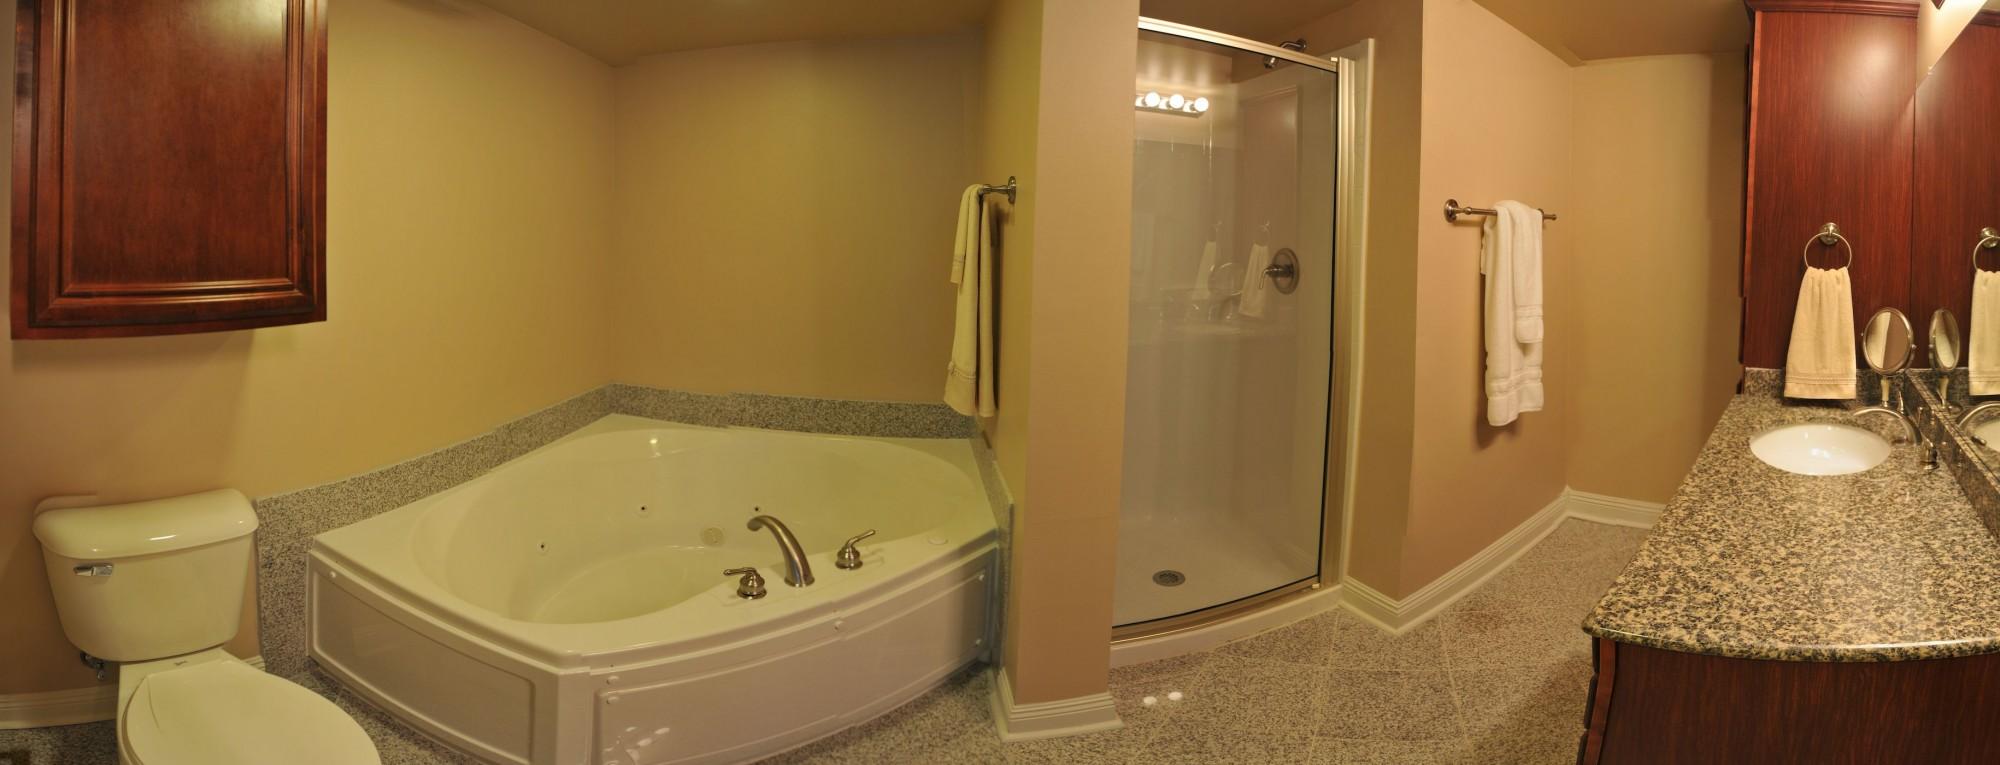 Kailas Companies bathroom-panoramic-compressor